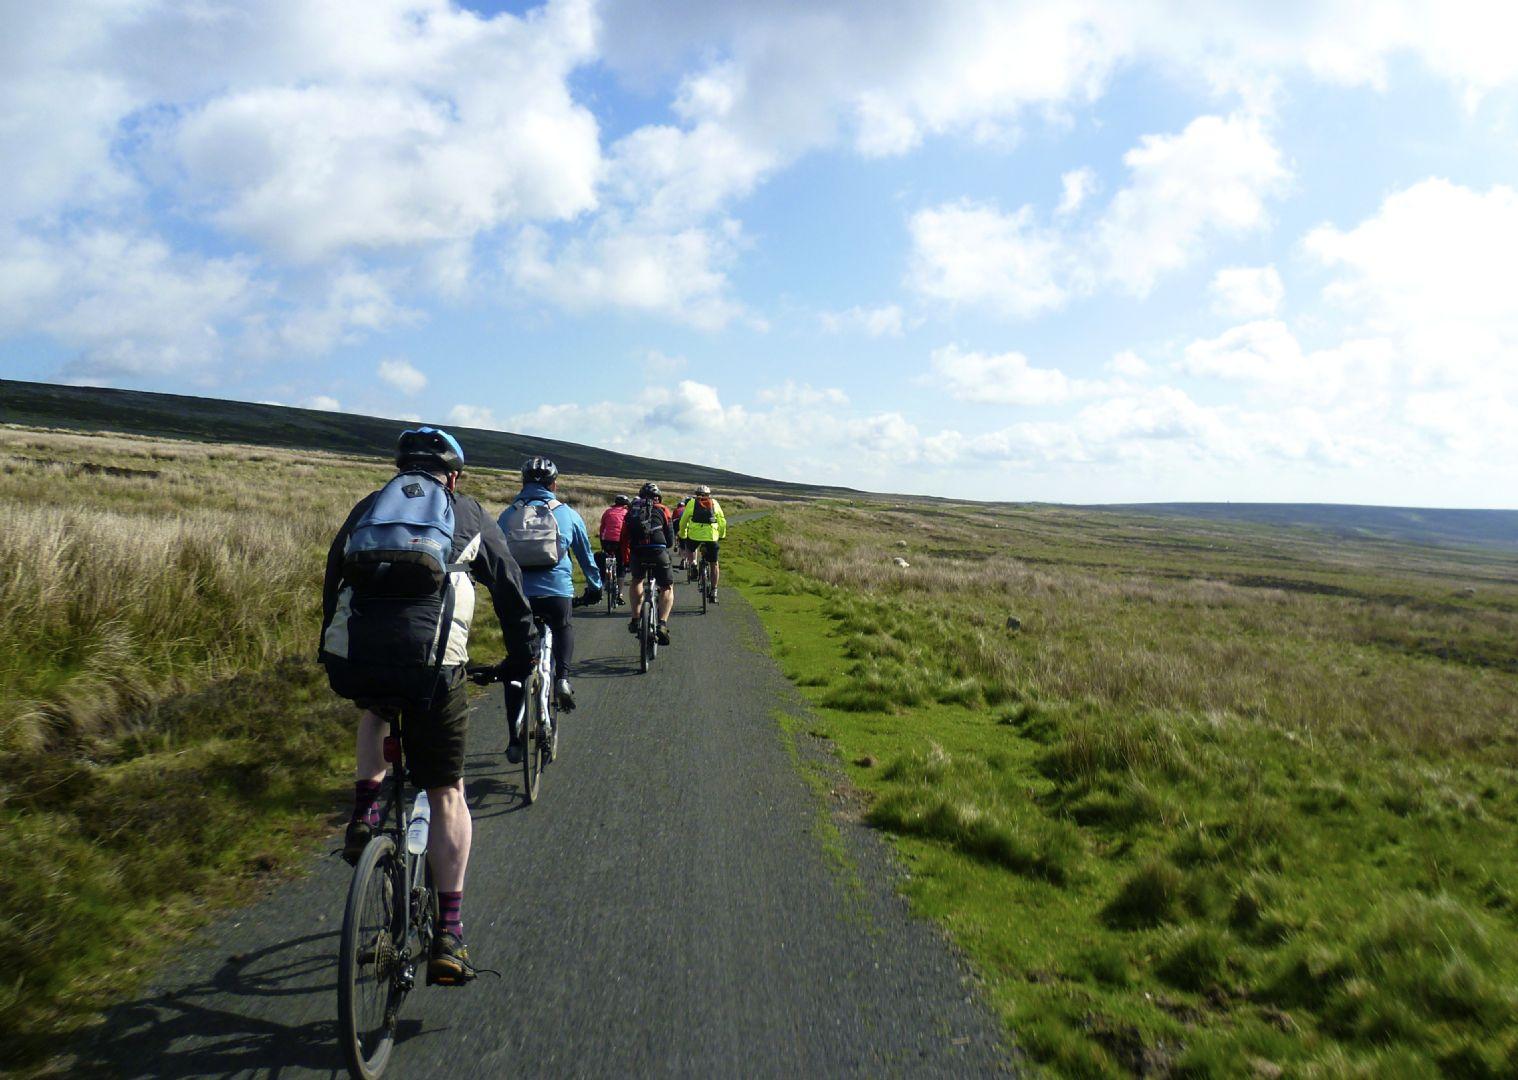 P1020465.jpg - UK - C2C - Coast to Coast 5 Days Cycling - Self-Guided Leisure Cycling Holiday - Leisure Cycling